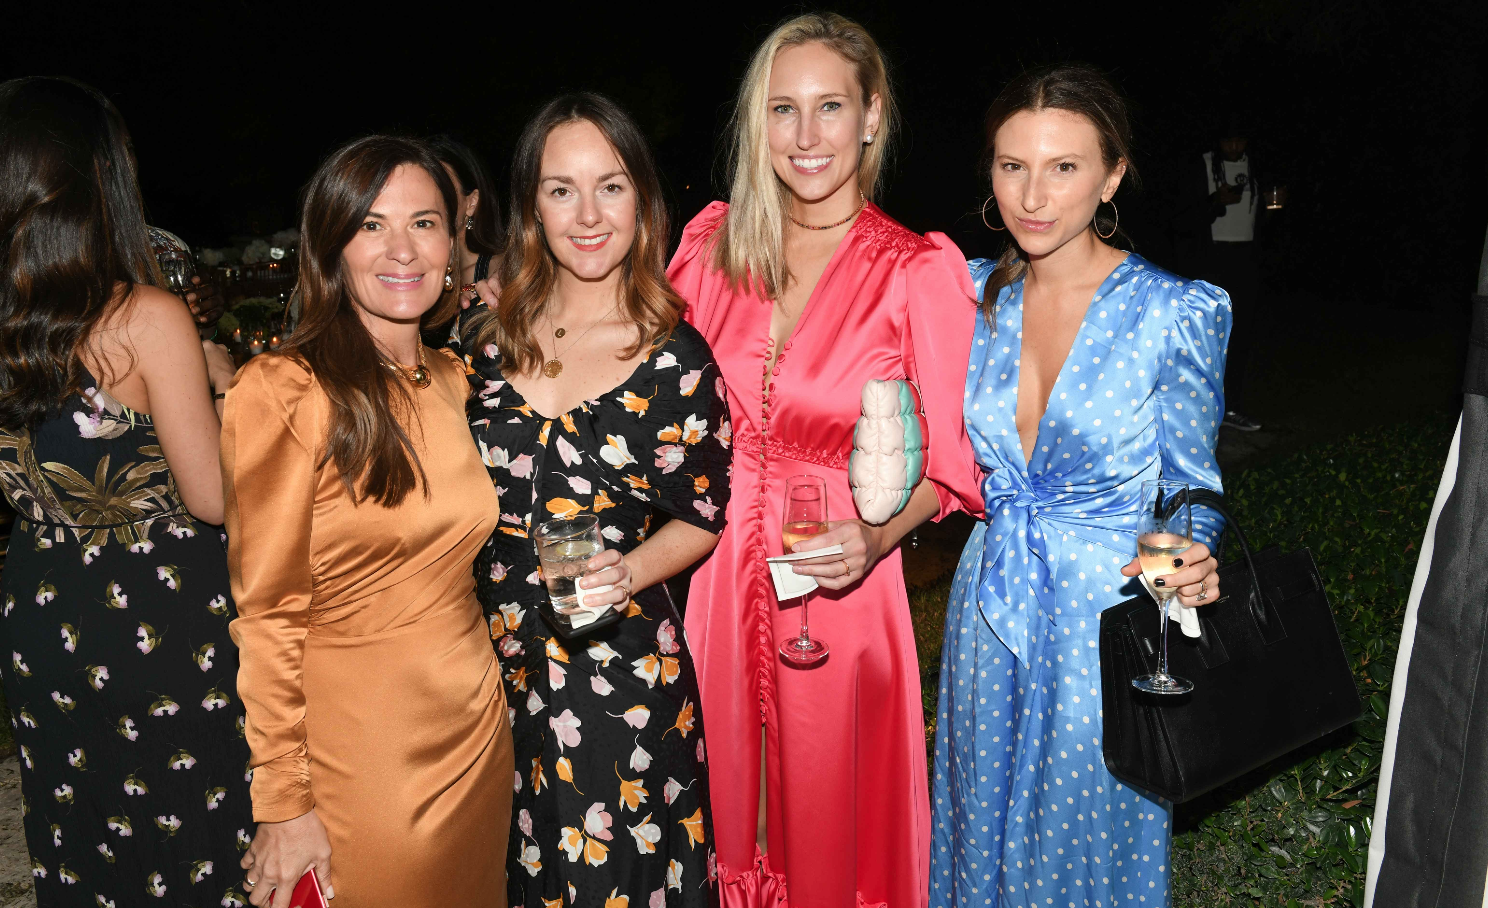 Sarah Harrelson, Sarah Claodney, Lauren Anderson and Lindsey Collins